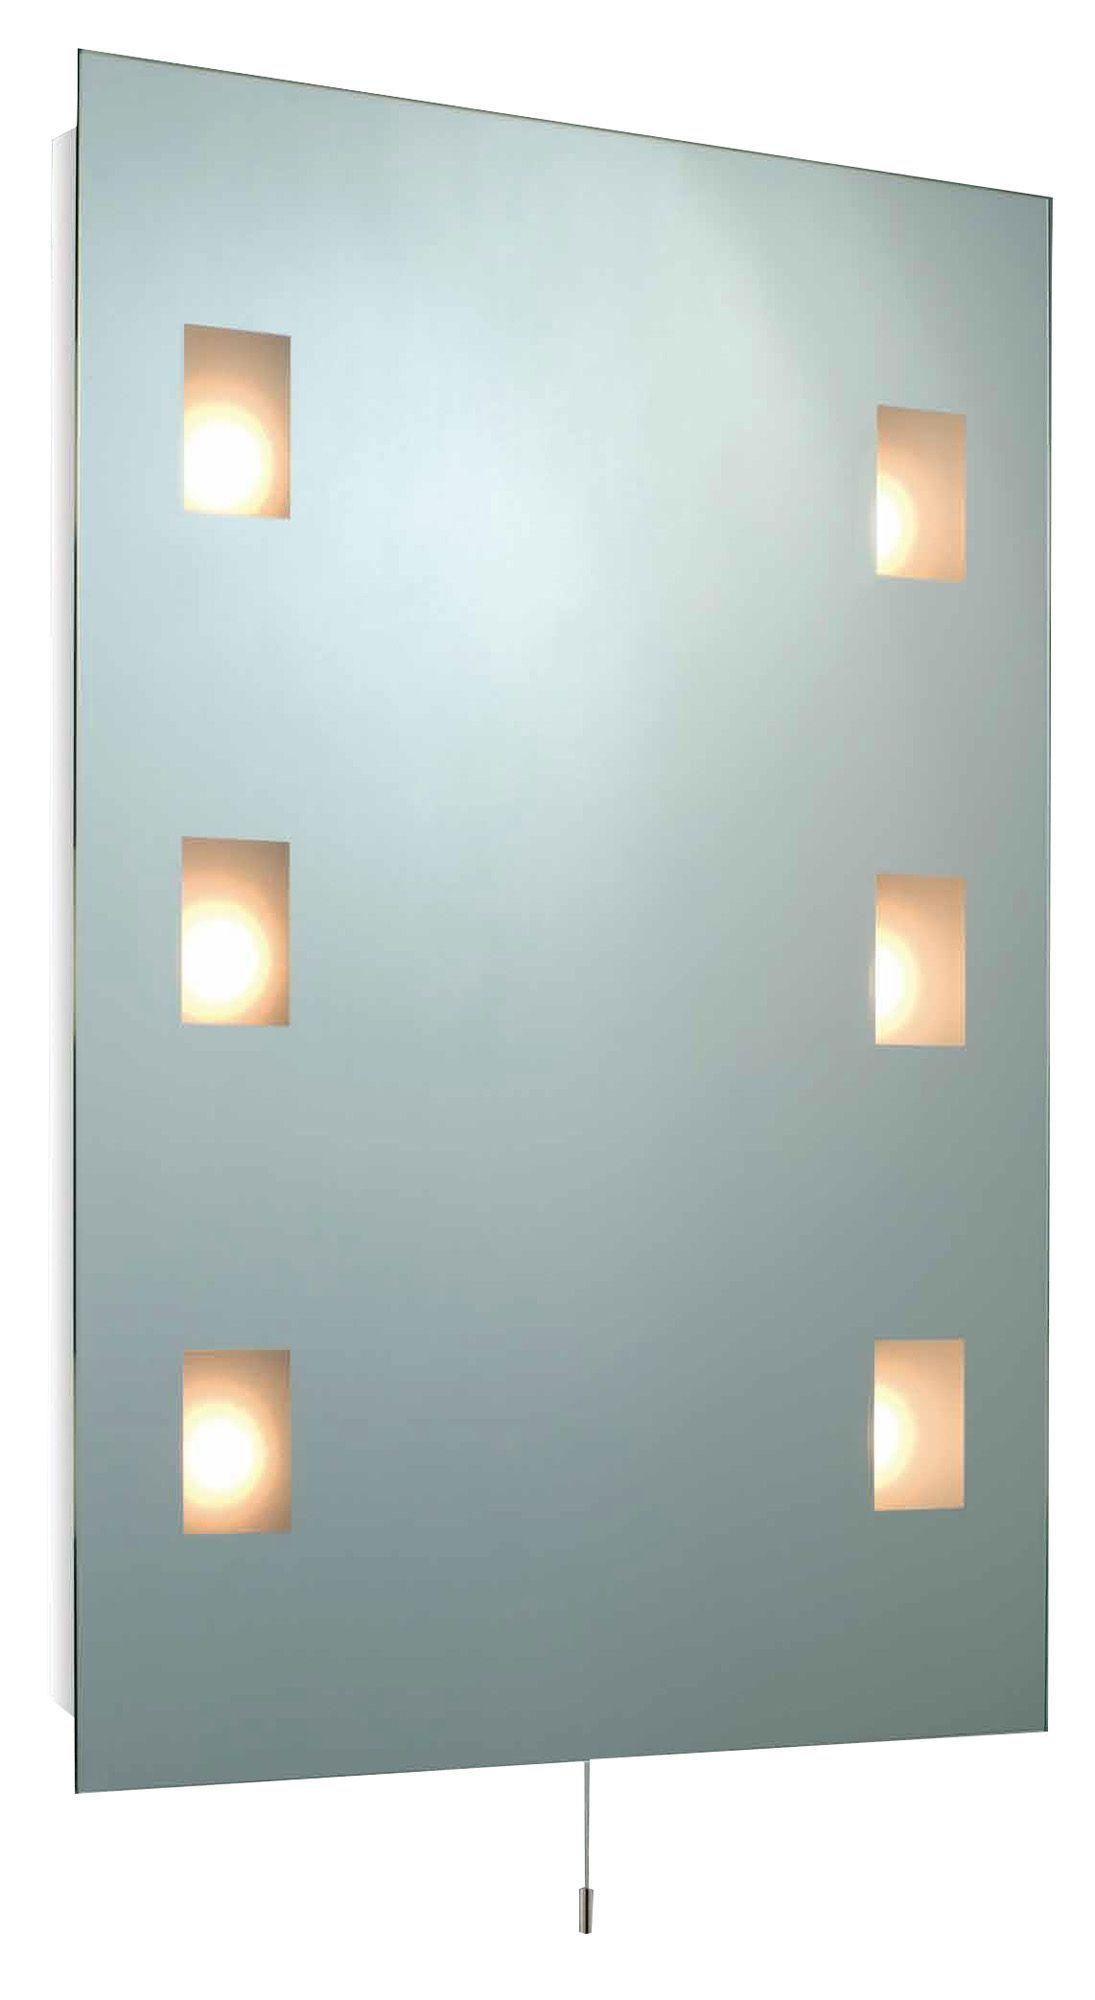 Bathroom Mirror Lights B&Q b&q enlighten illuminated rectangular mirror (w)580mm (h)780mm